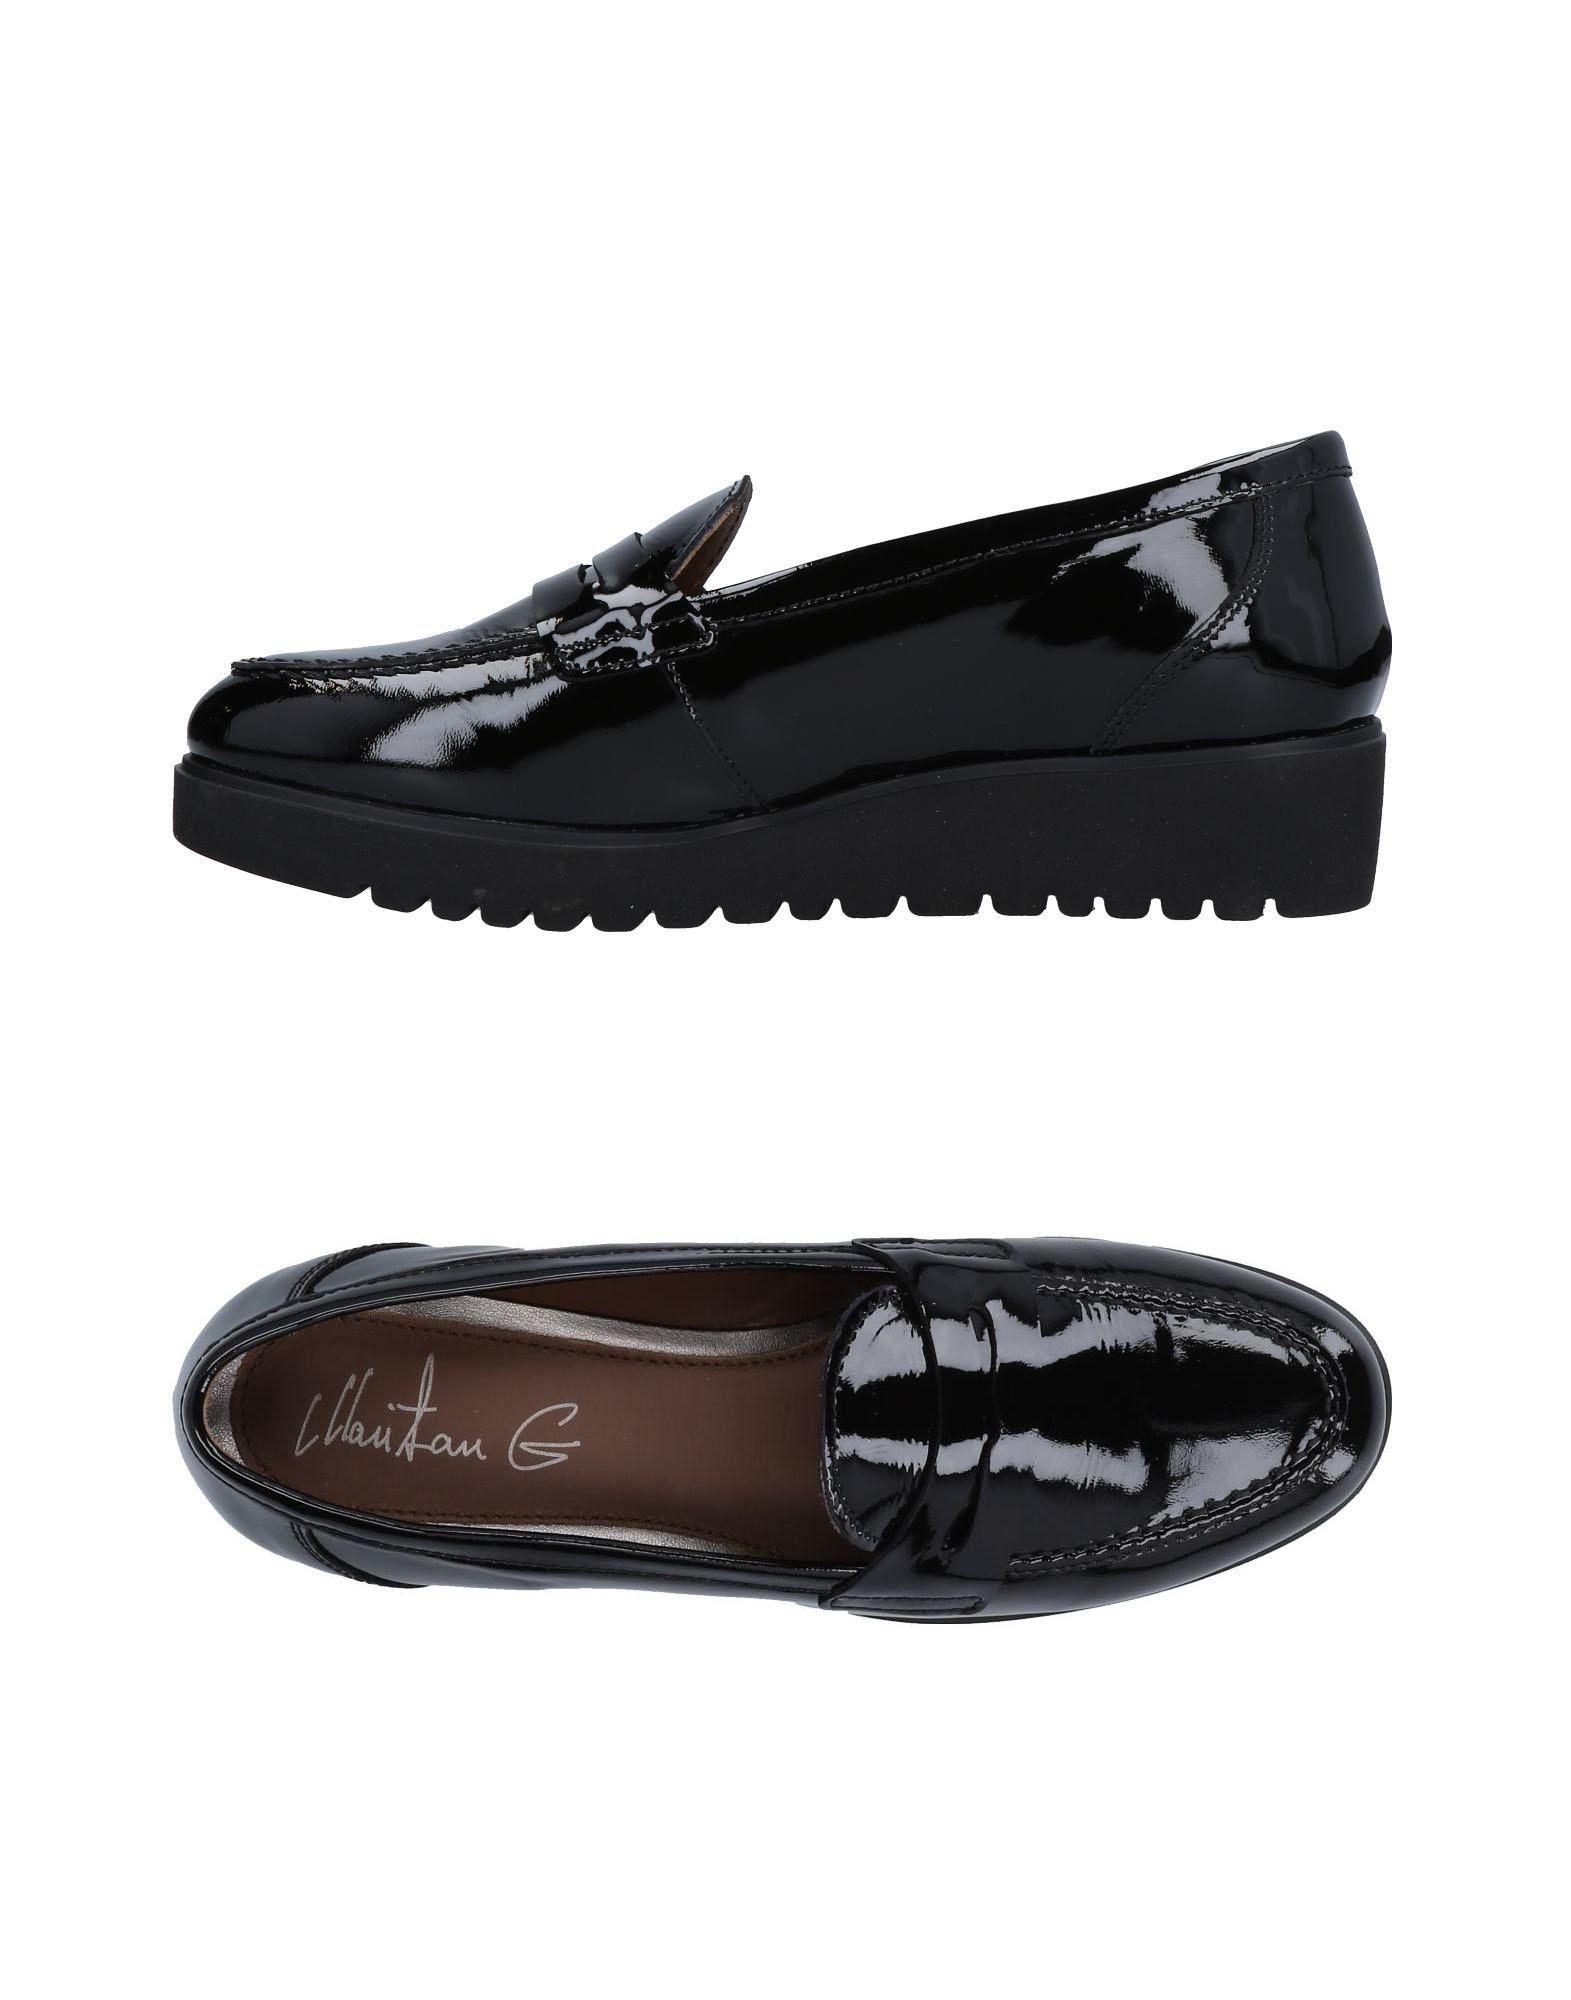 Maritan G Loafers - Women Maritan  G Loafers online on  Maritan Australia - 11503560PR 0809ae